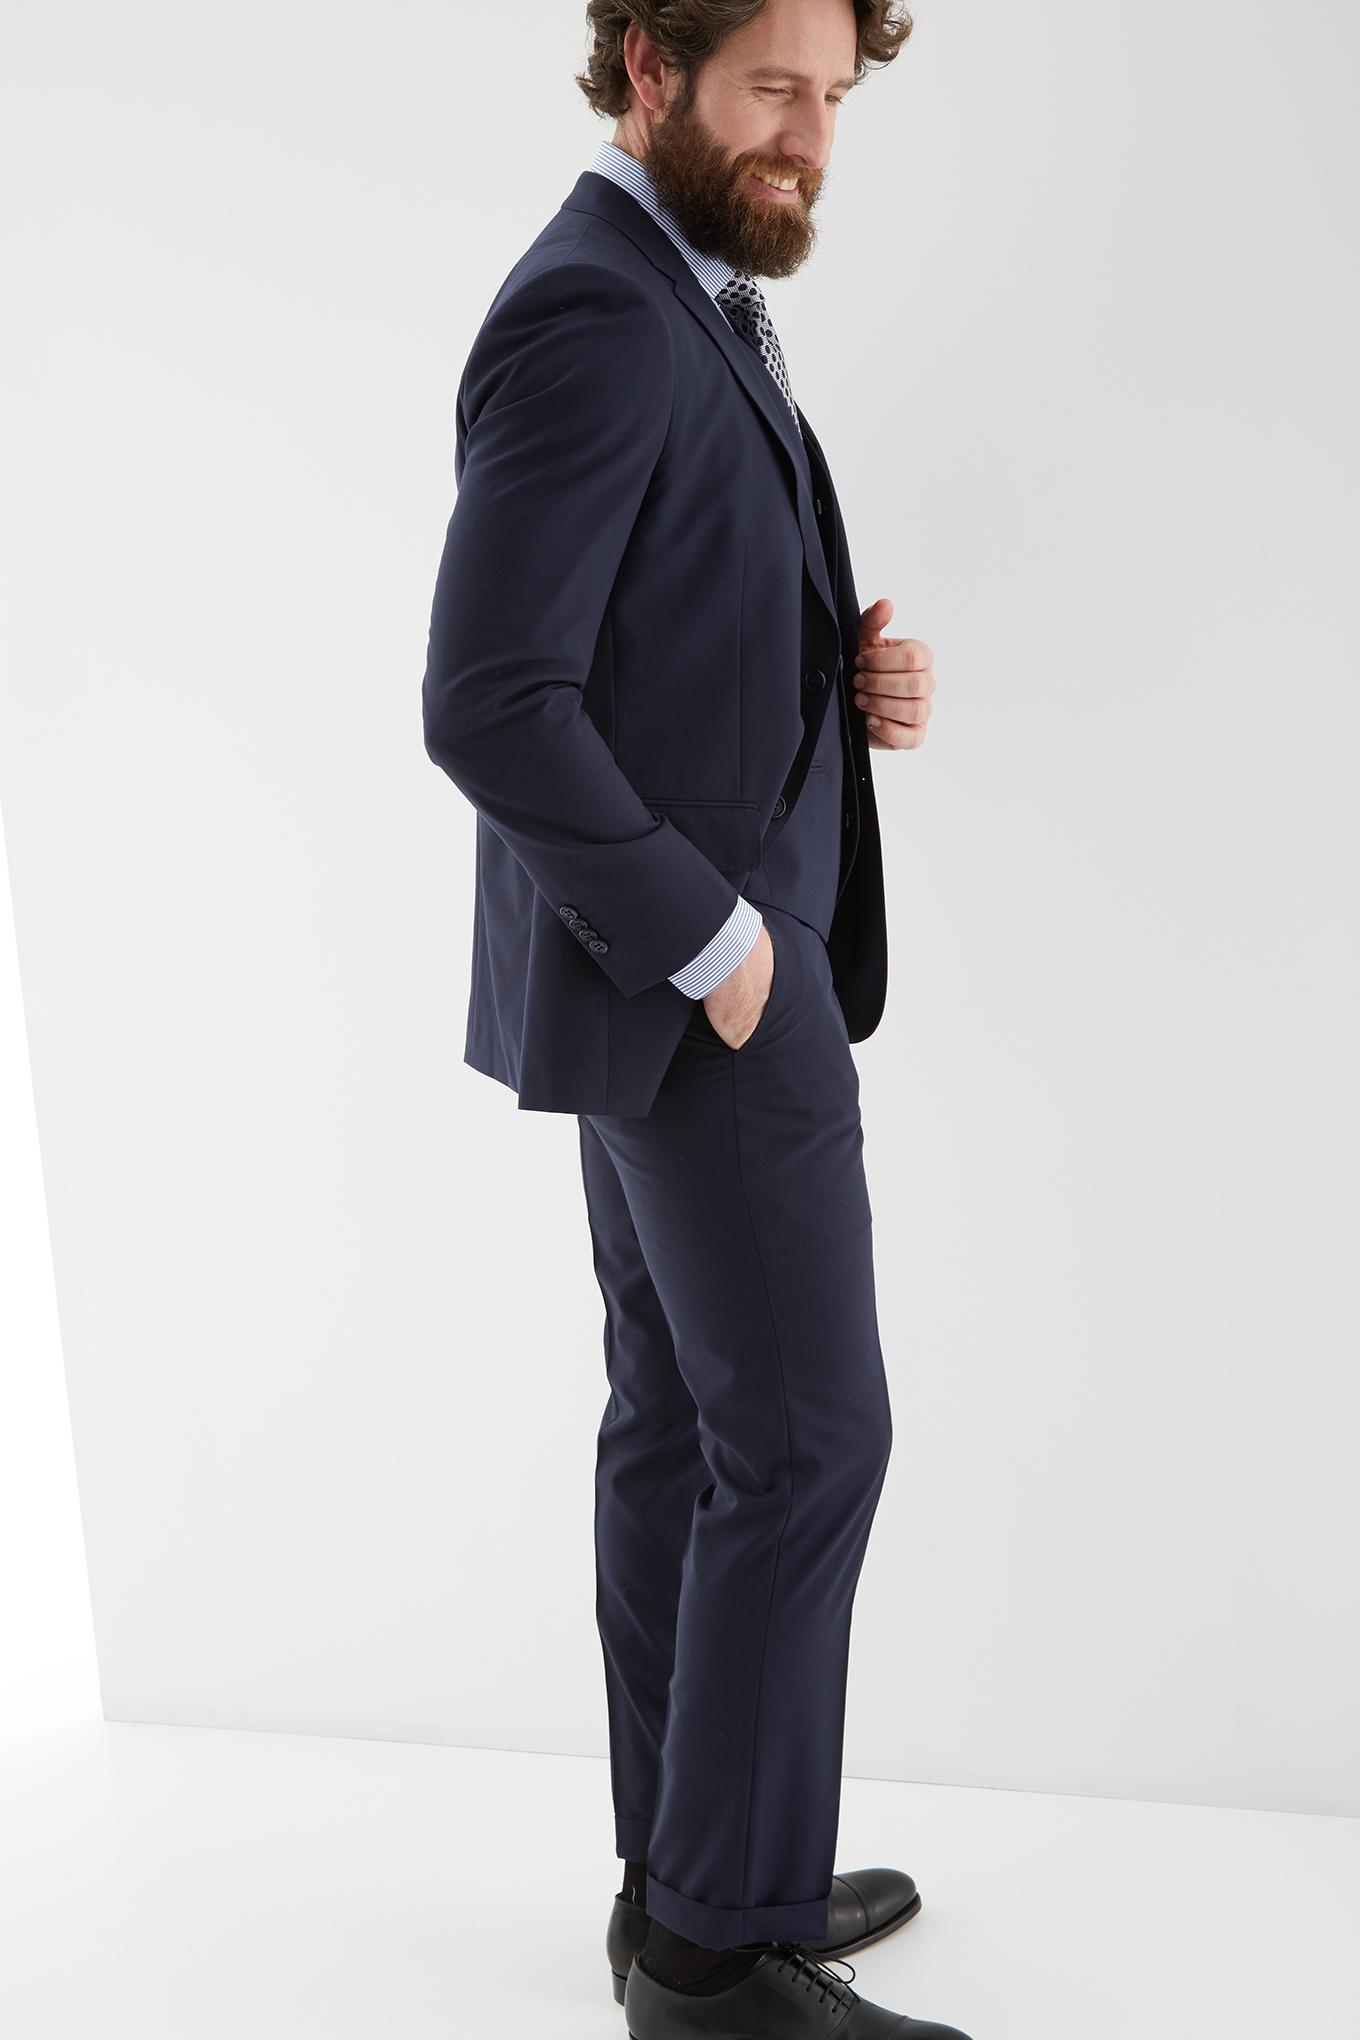 Suit with Vest Dark Blue Classic Man